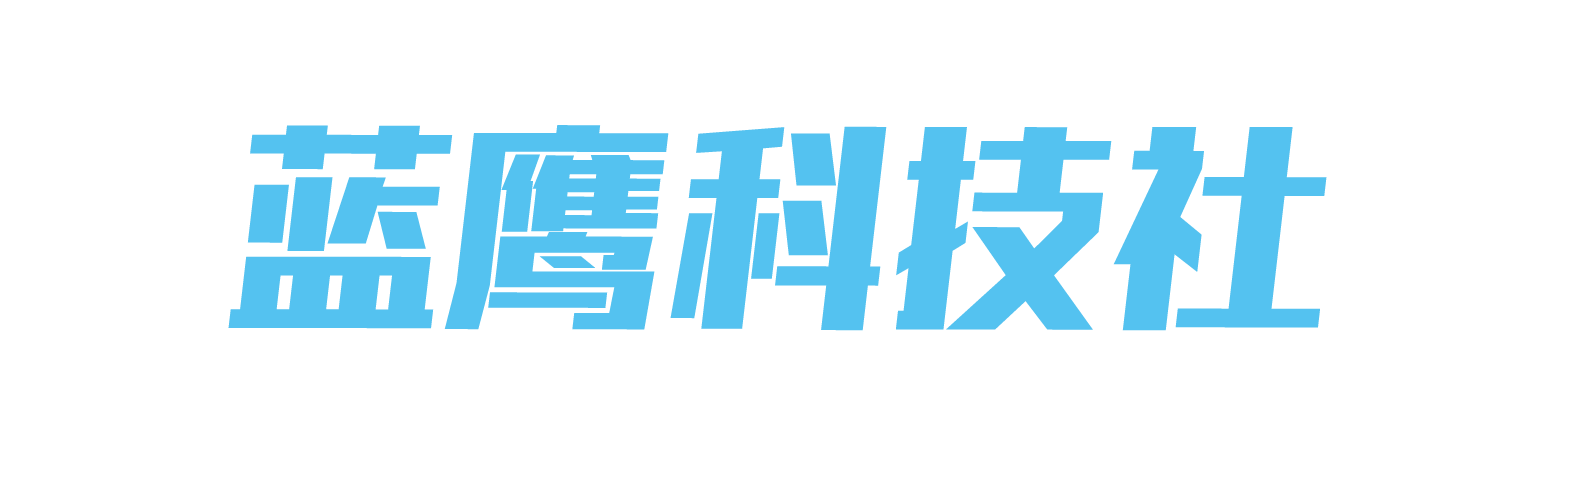 chinese logo1